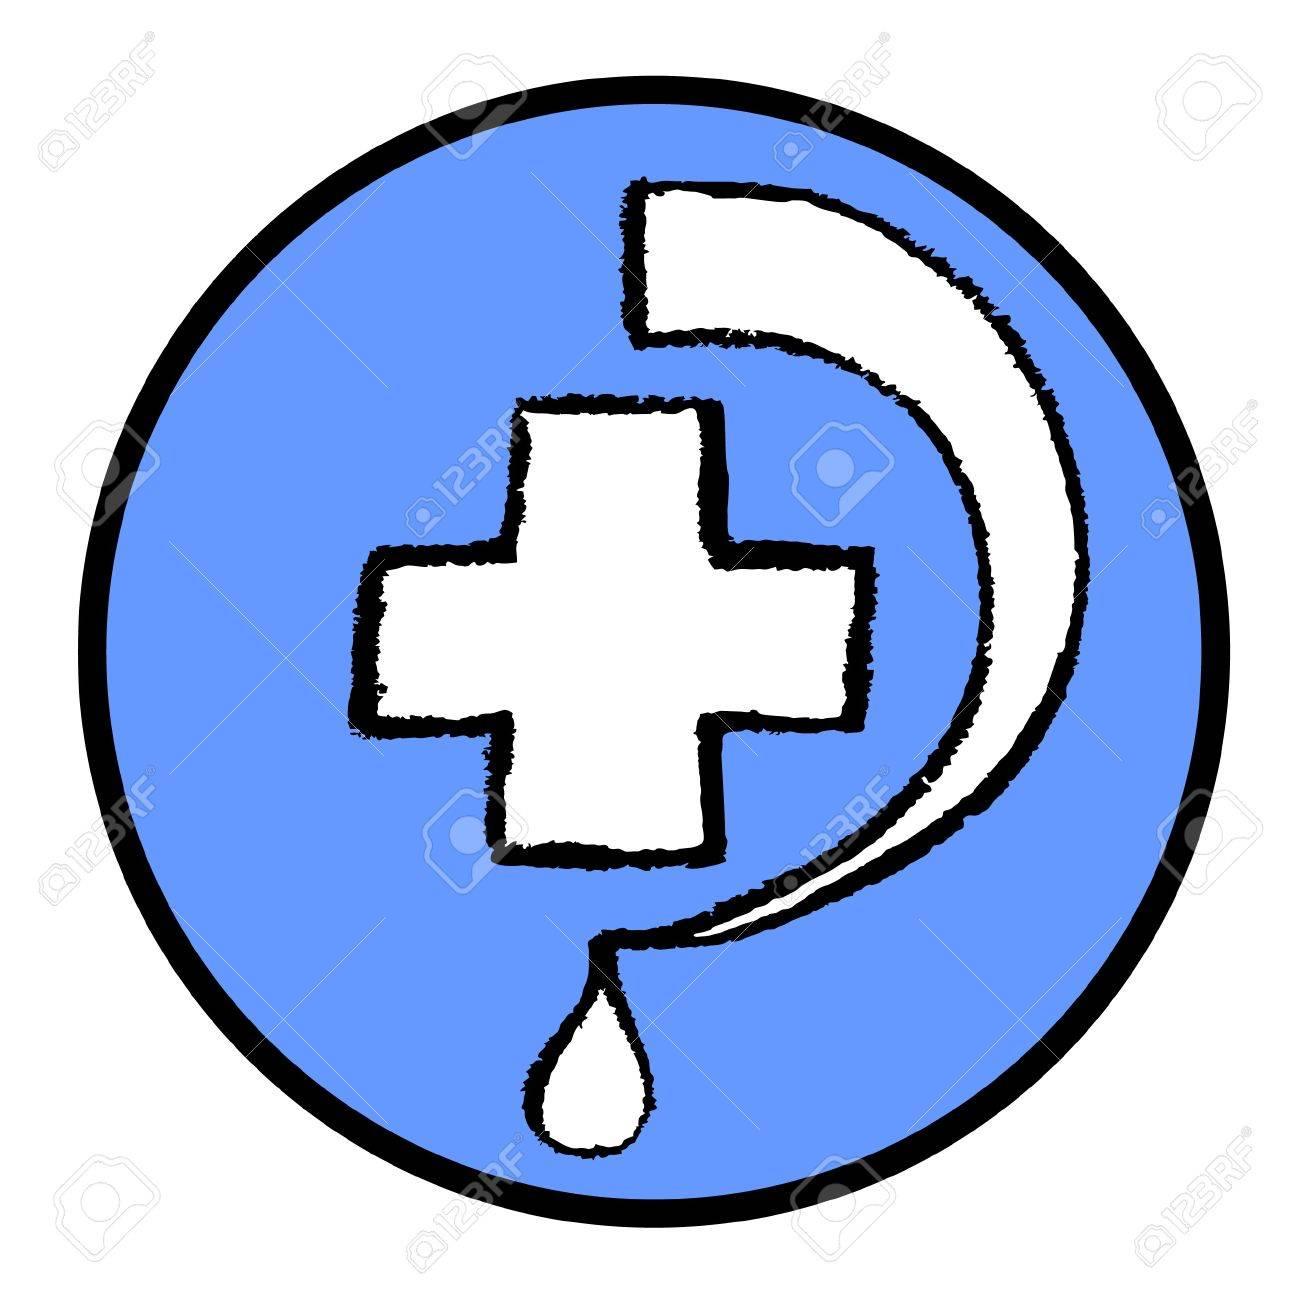 Health symbol Stock Vector - 12248060